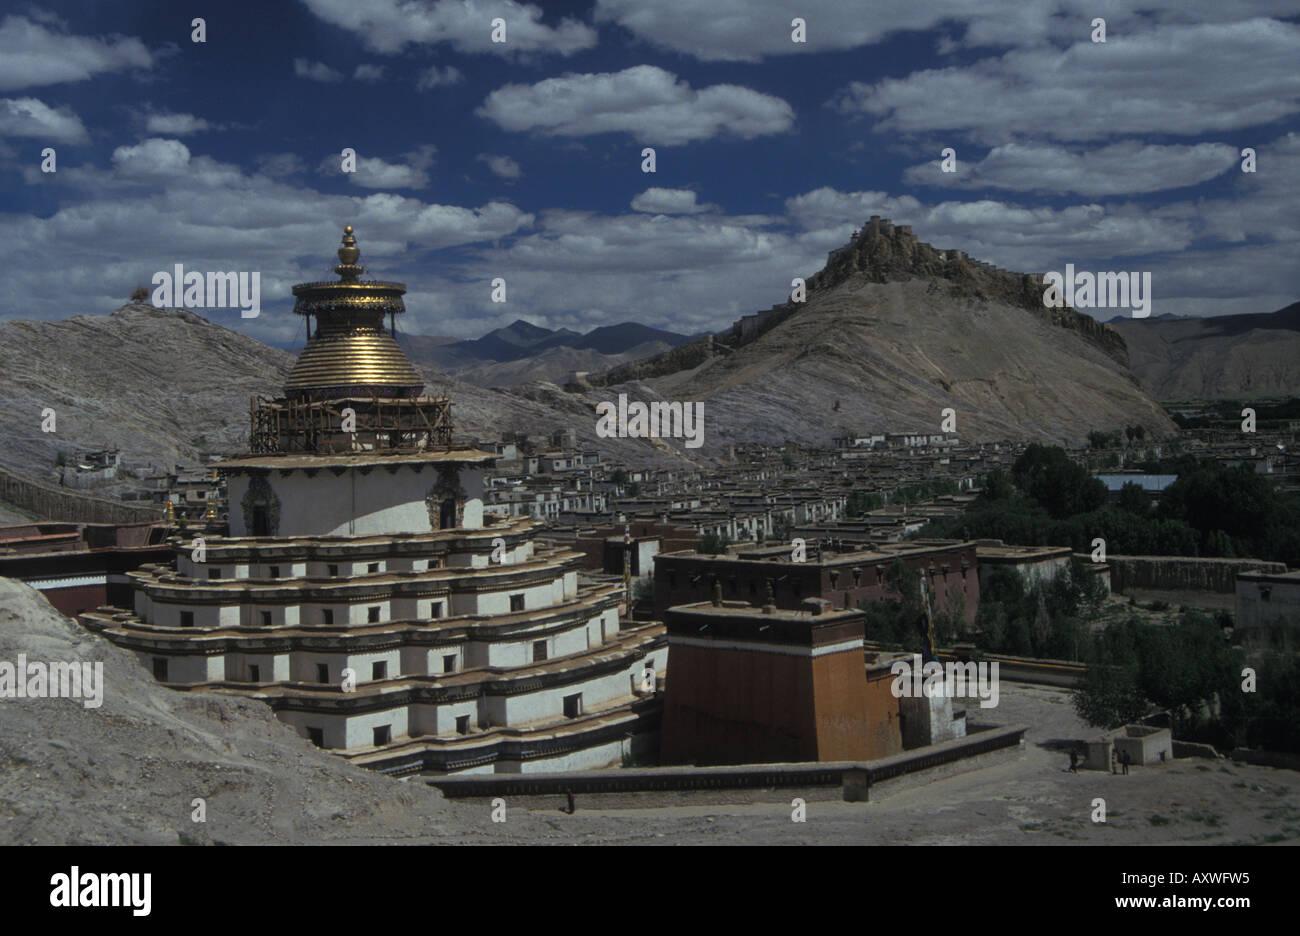 Tibetan Buddhist stupa and gompa fort in background Gyantse Tibetan Plateau Tibet Autonomous Region Peoples Republic of China - Stock Image